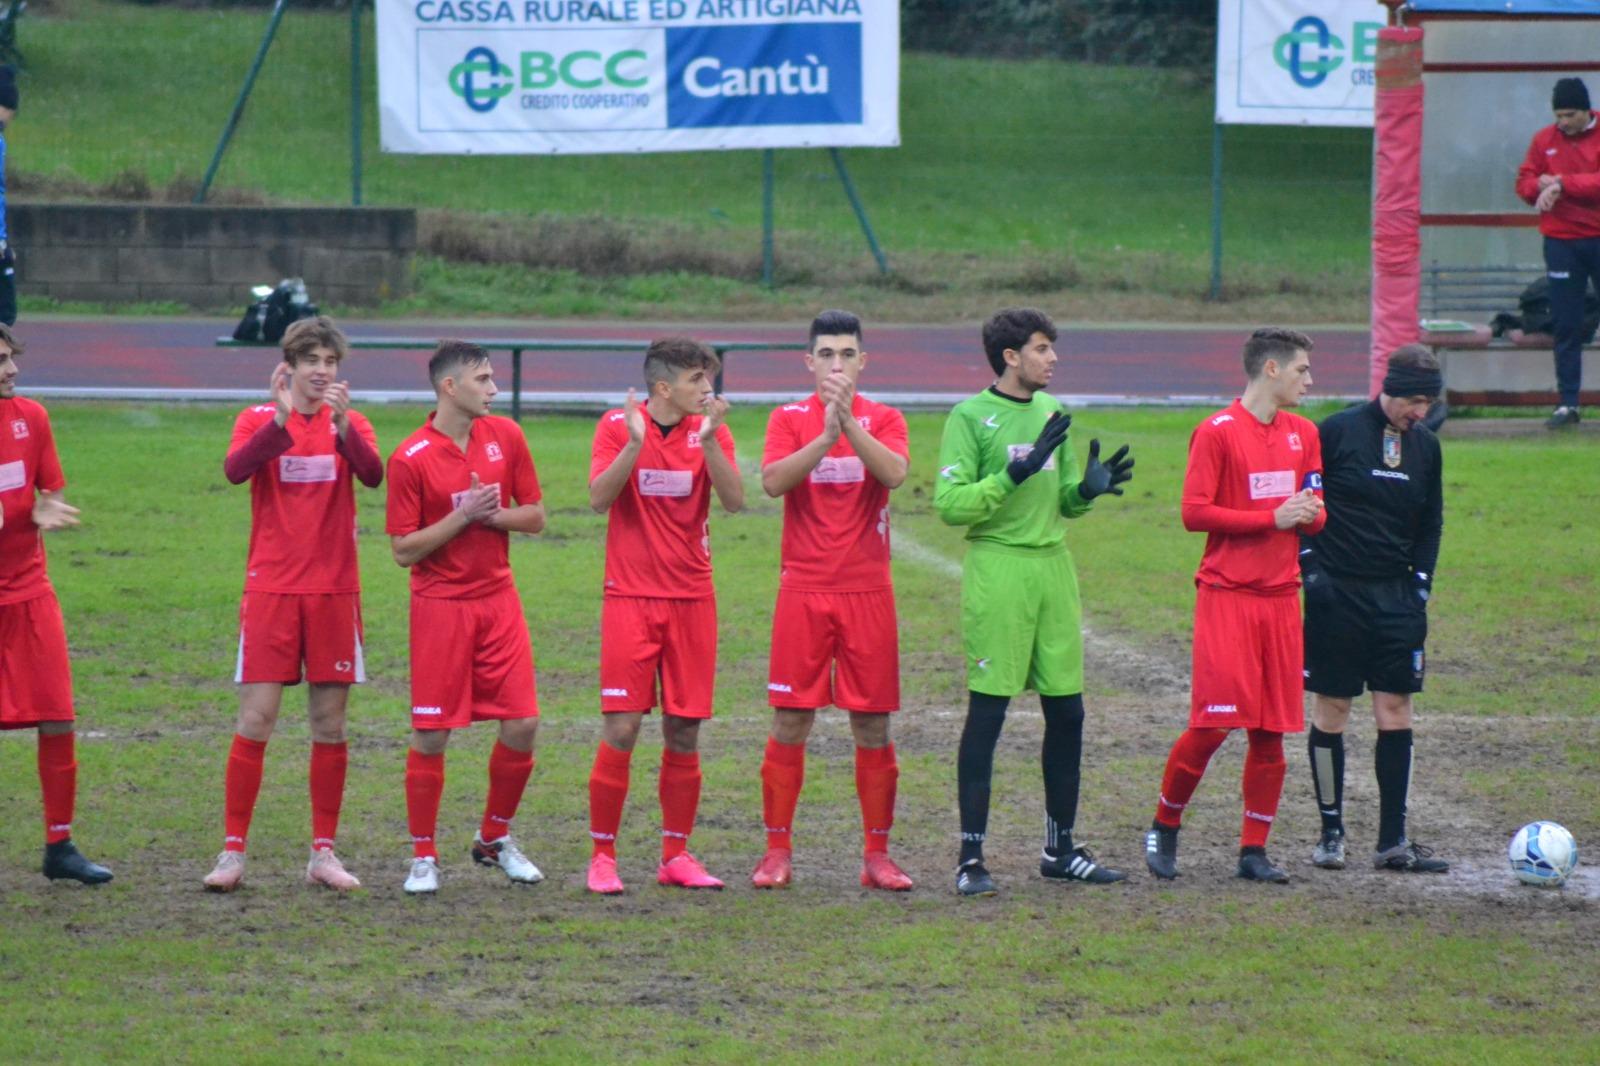 Juniores regionale BASD CANTU'SANPAOLO 2 Mariano 0